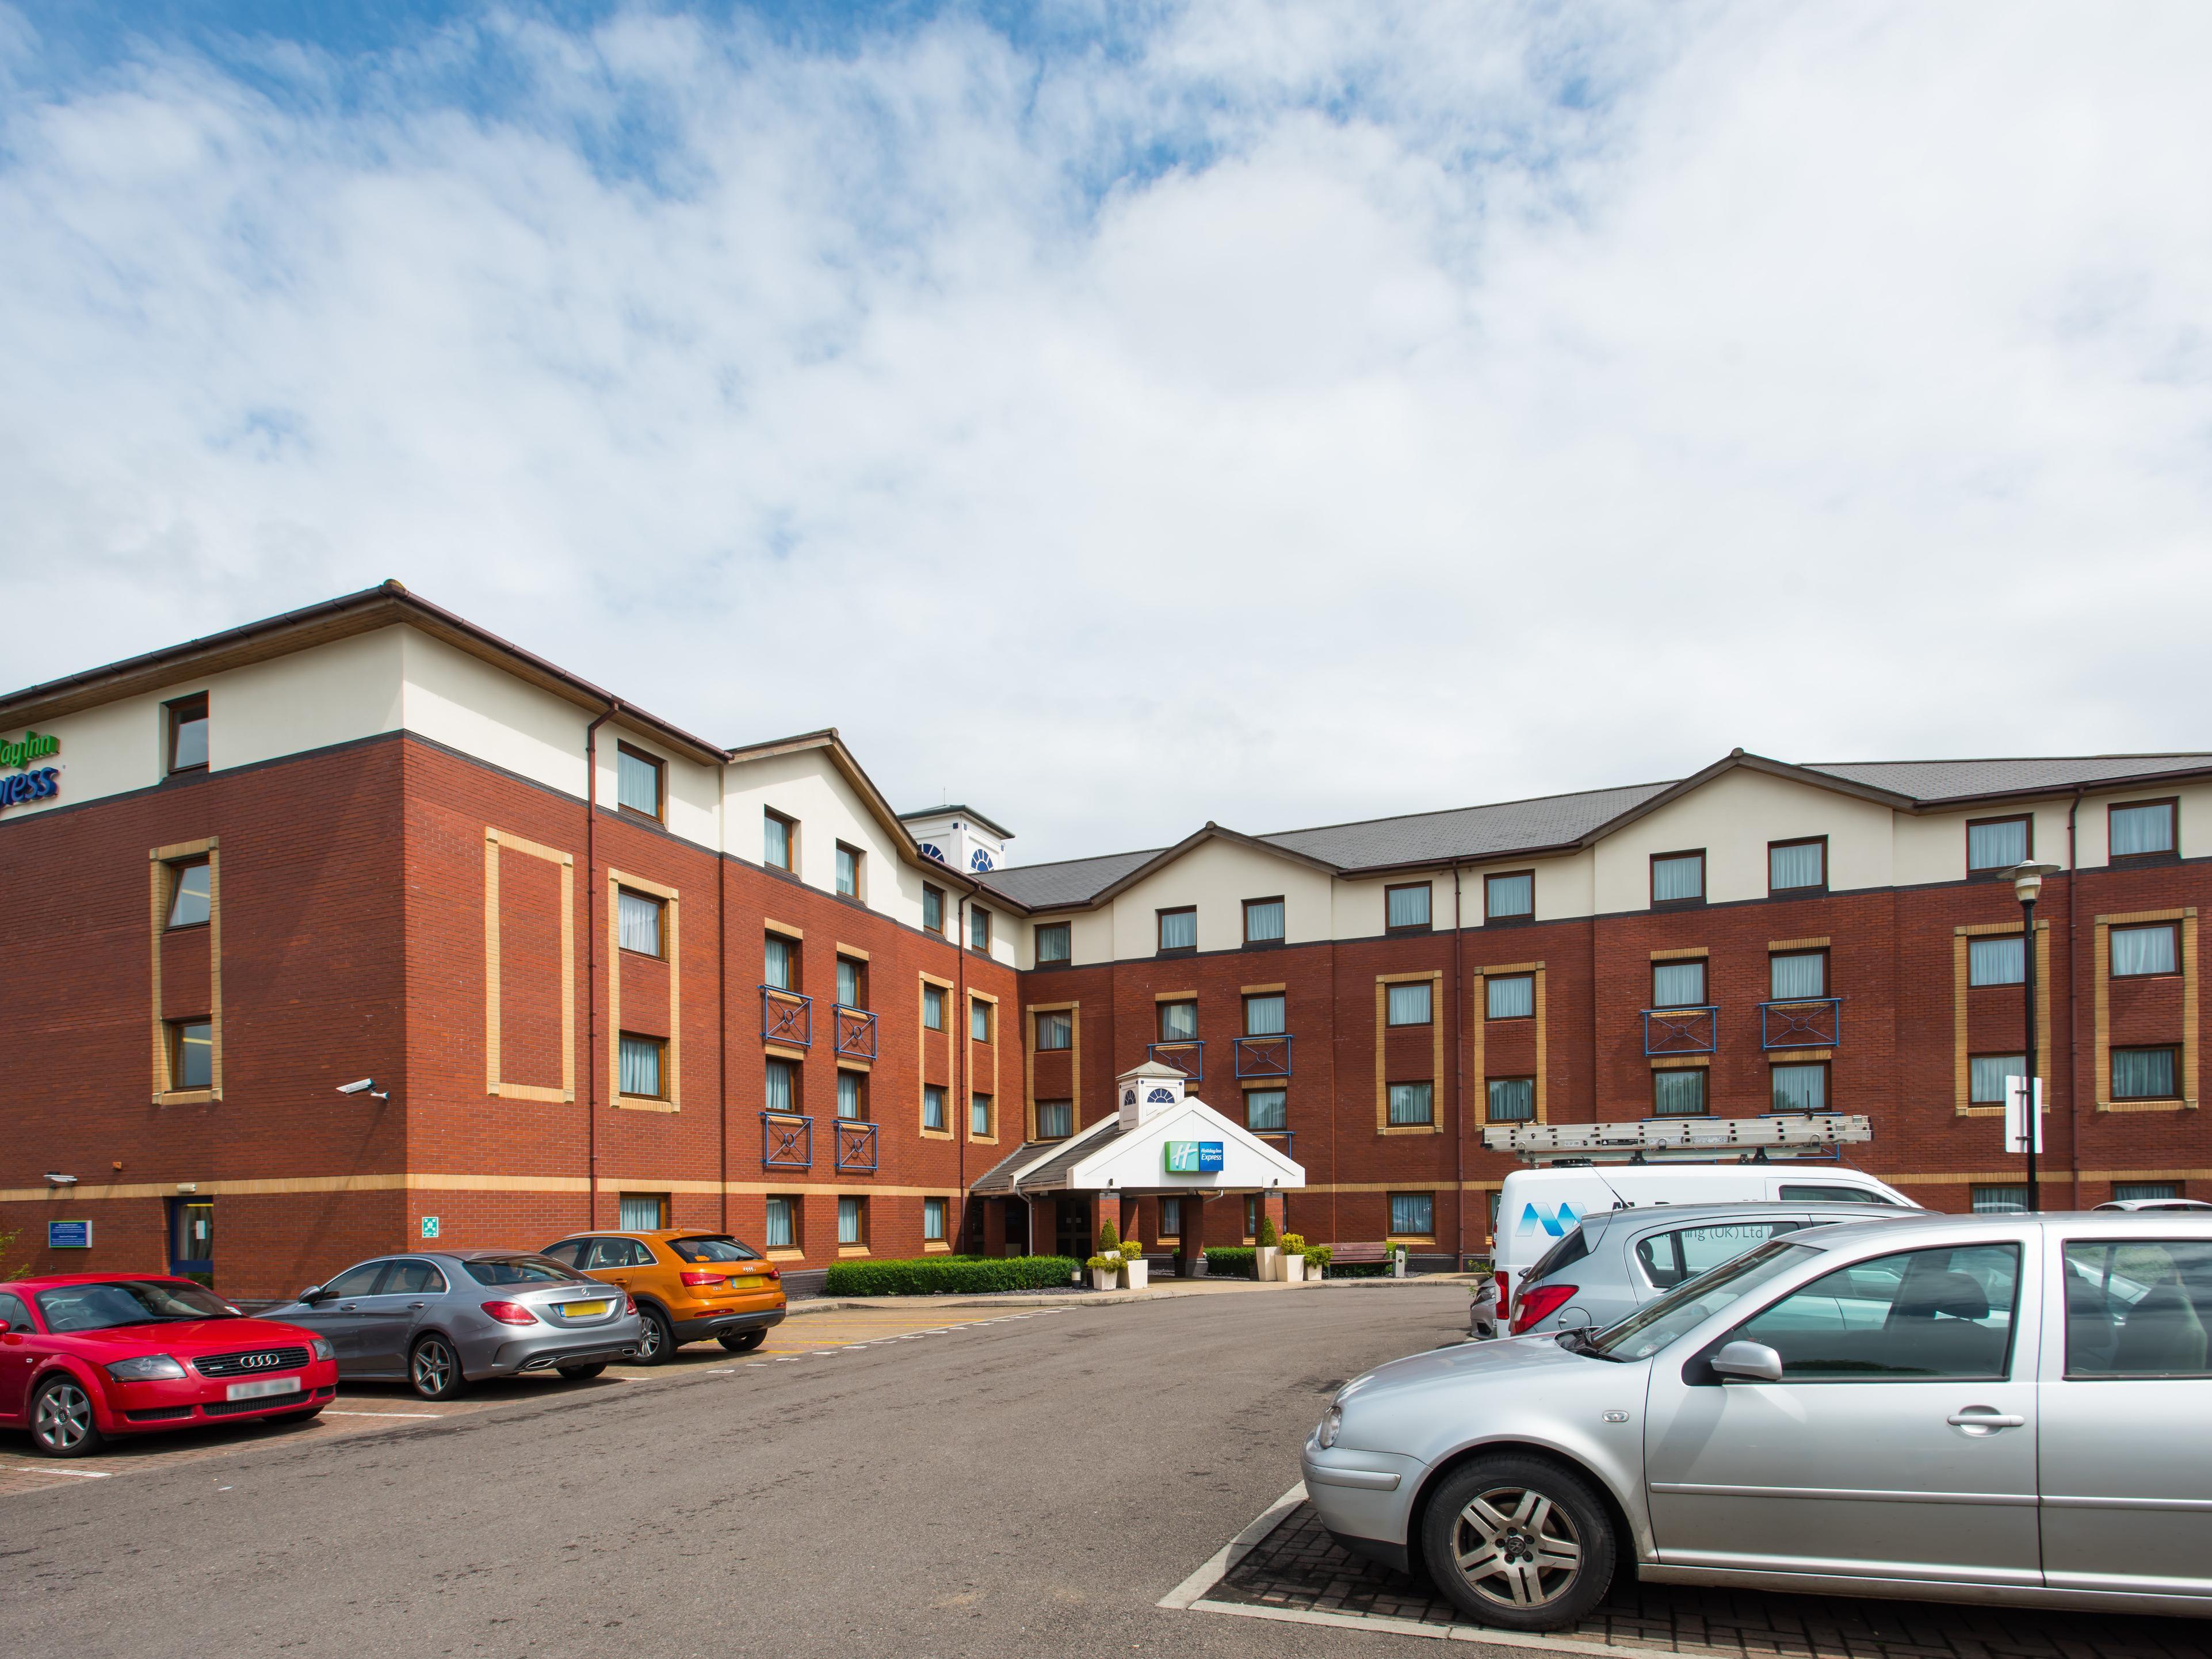 Hotel near parkway holiday inn express bristol filton reheart Images